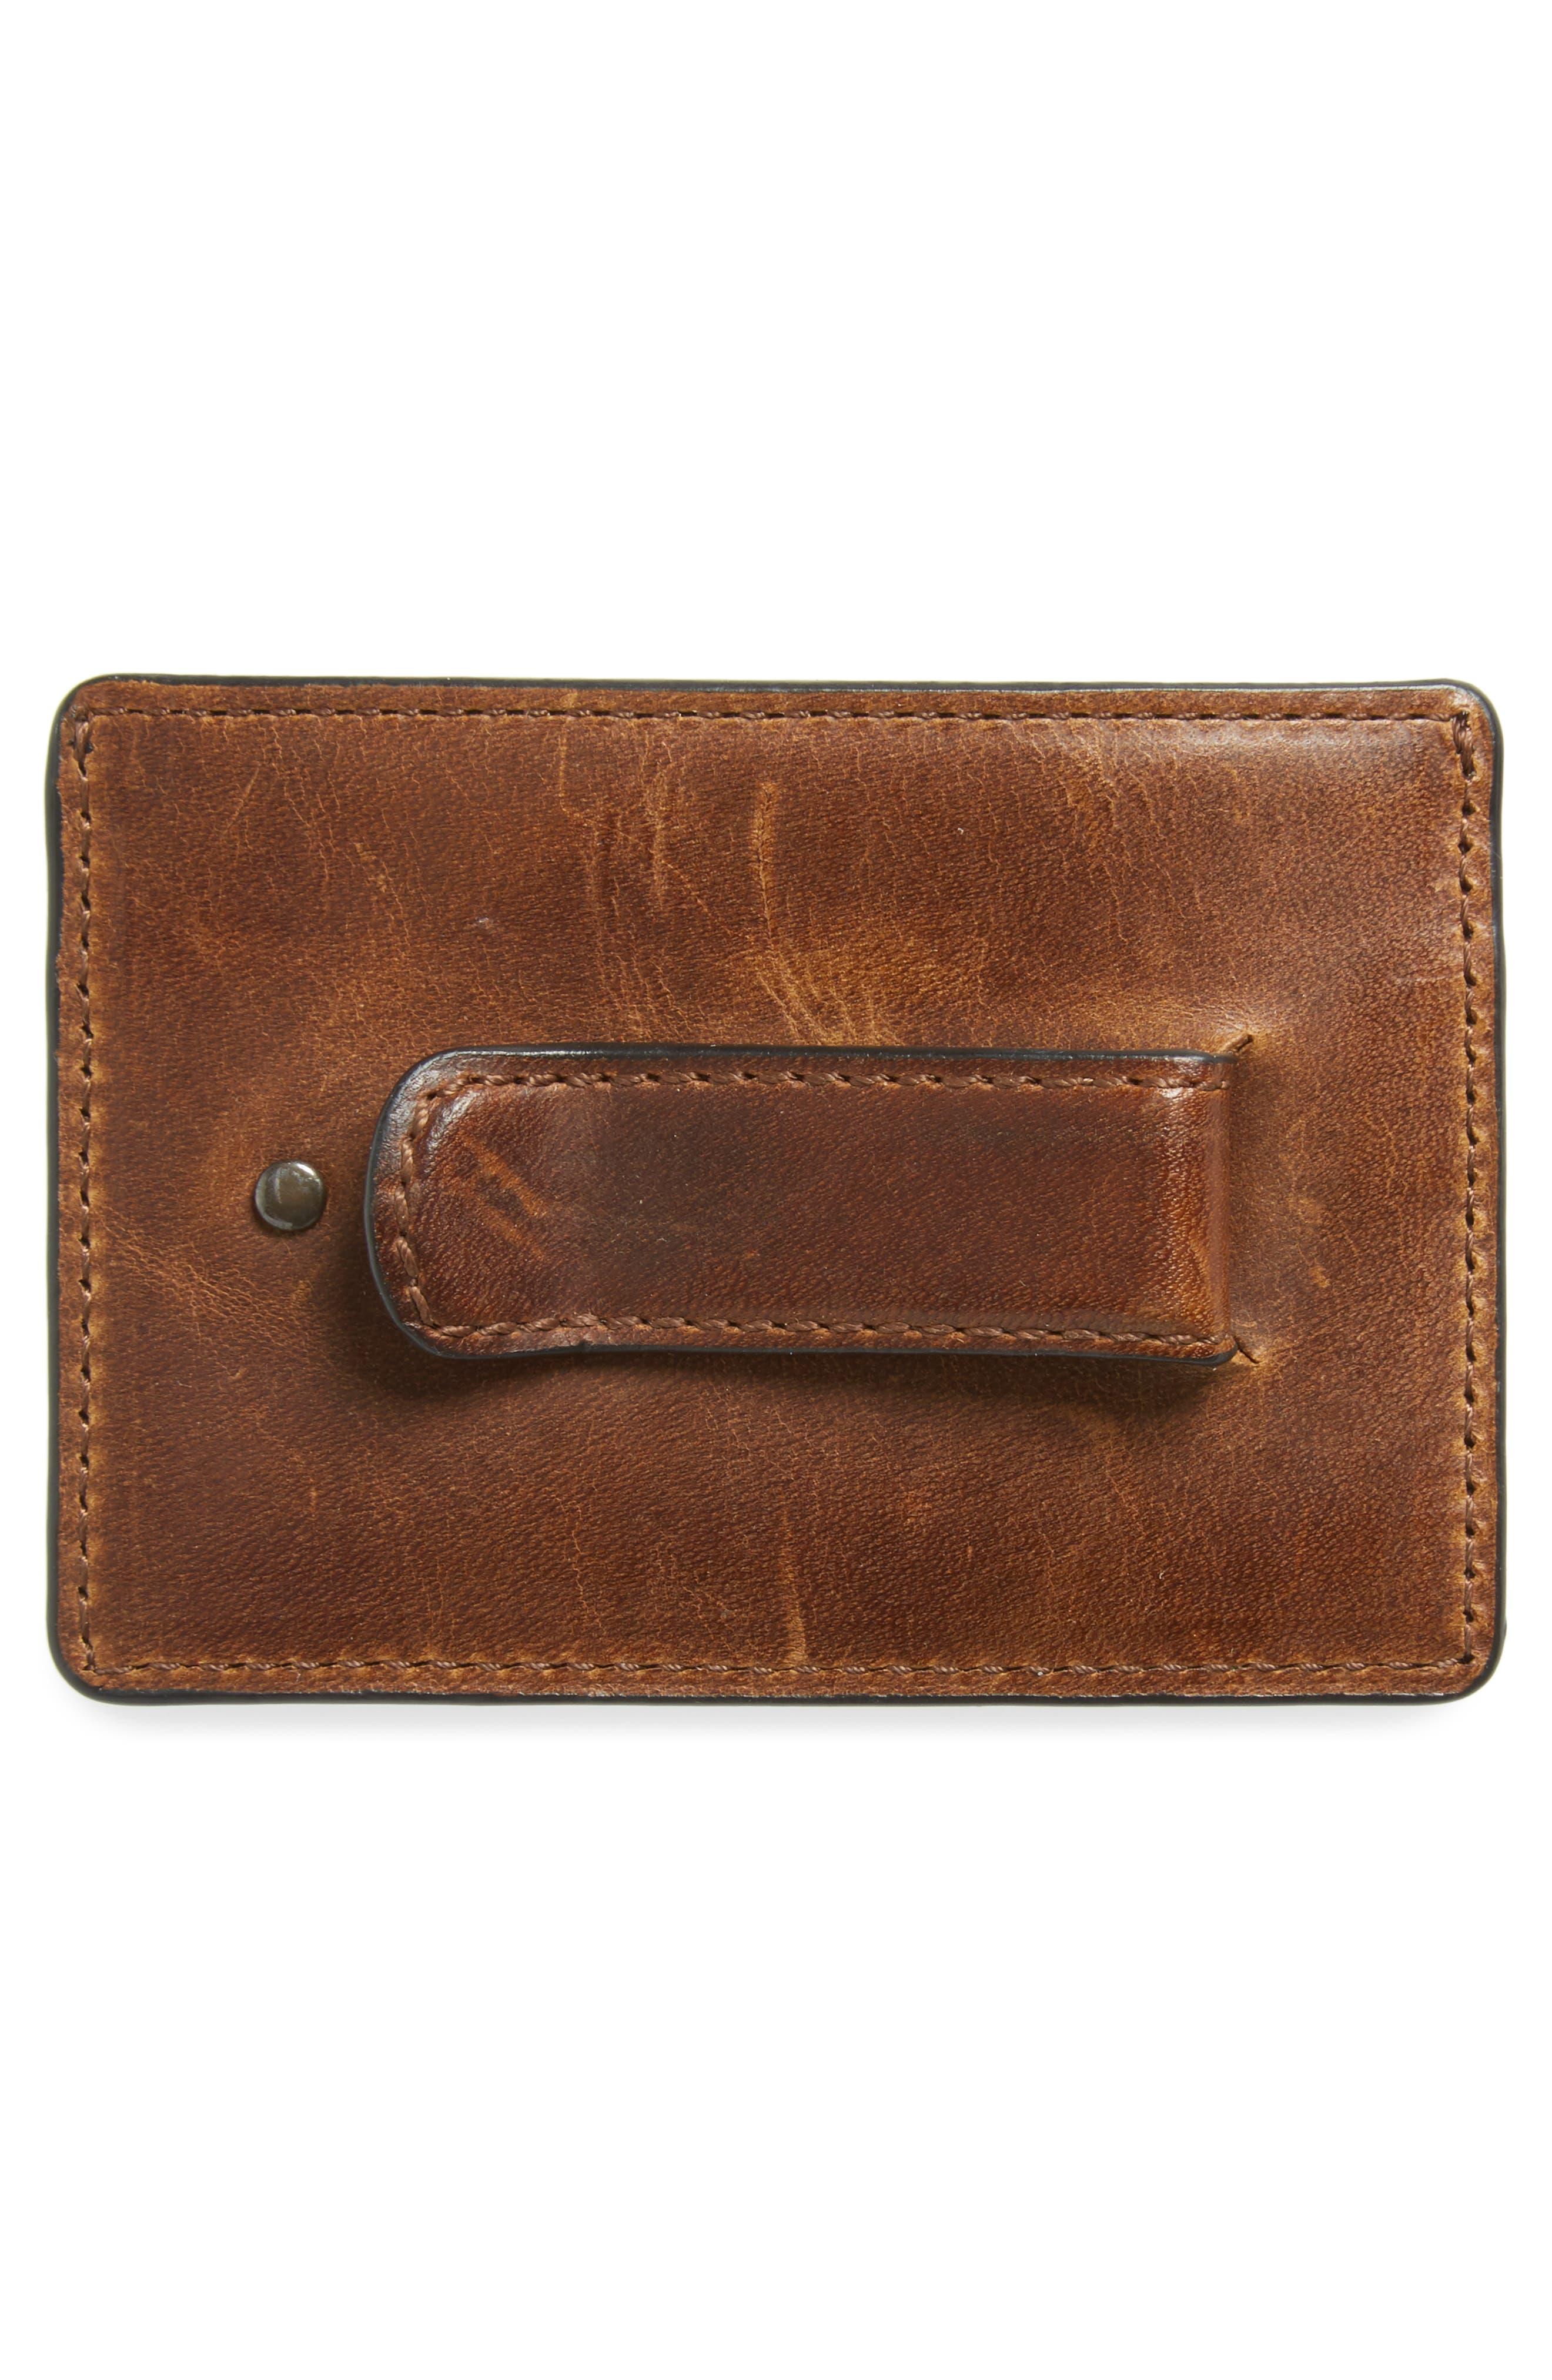 FRYE, Logan Leather Money Clip Card Case, Alternate thumbnail 2, color, DARK BROWN